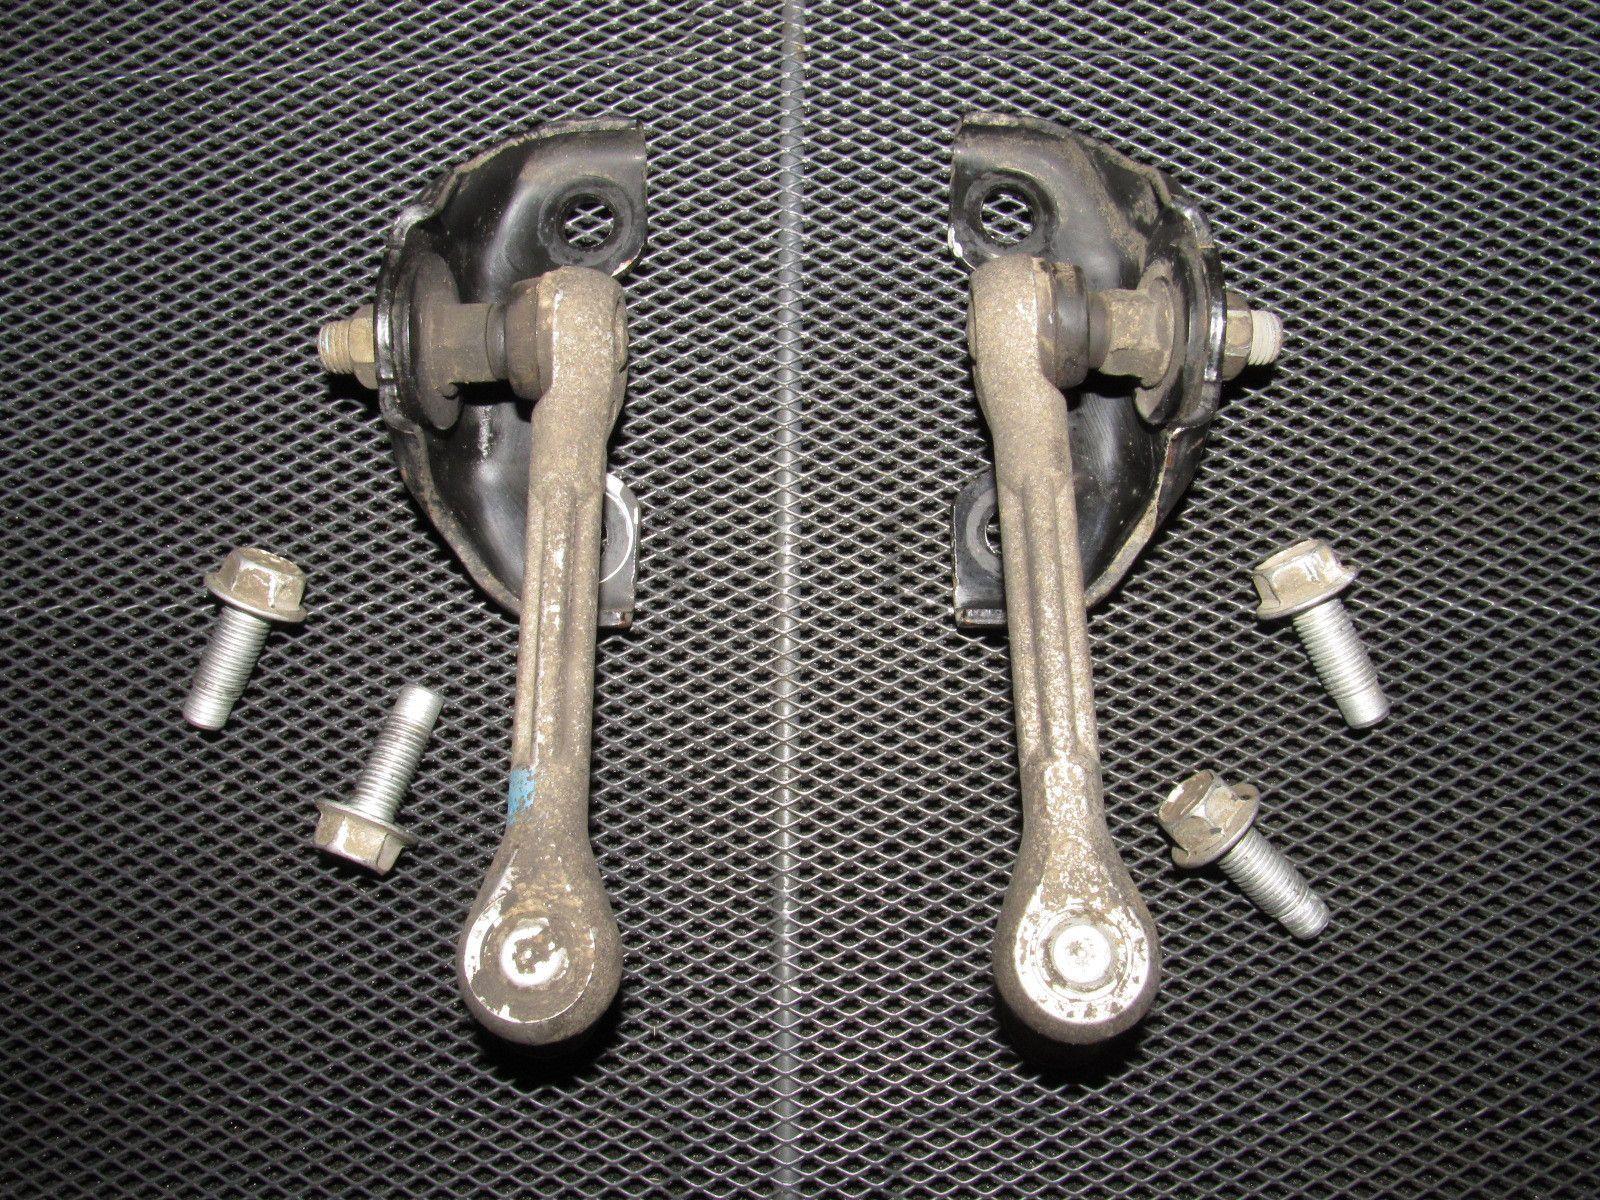 Infiniti G Sedan OEM Rear Stabilizer Bar Link Set - Throttle control motor relay g35